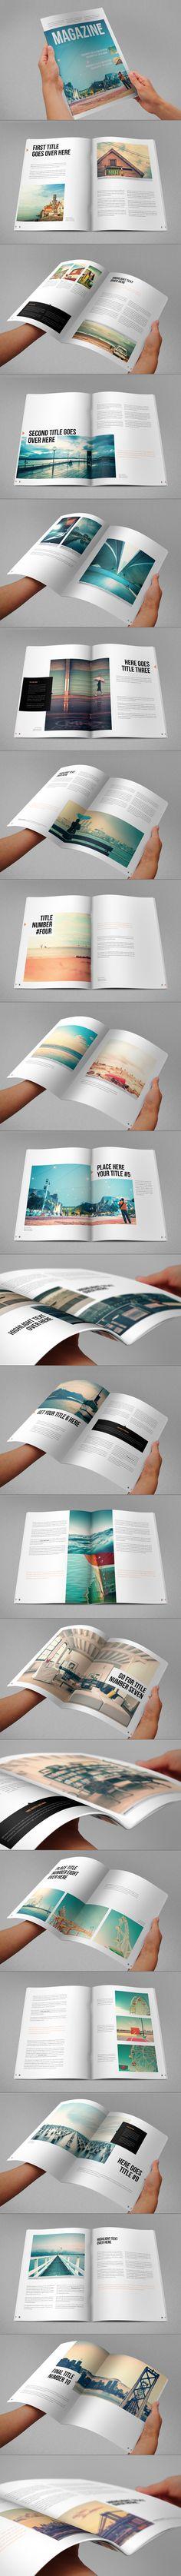 Minimal Magazine. Download here: http://graphicriver.net/item/minimal-magazine/6680861?ref=abradesign #design #magazine